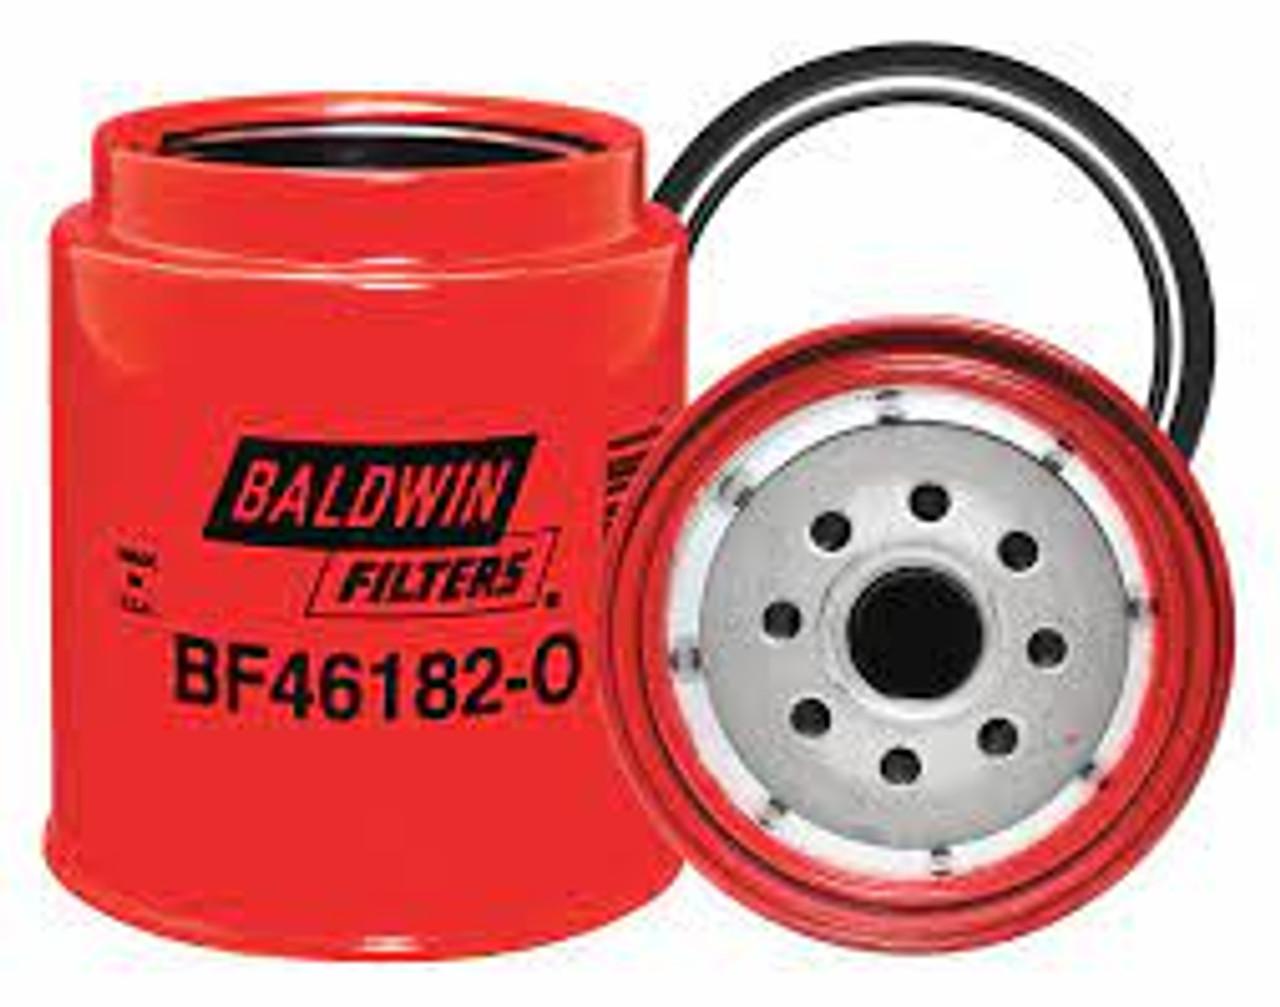 BALDWIN BF46182-O